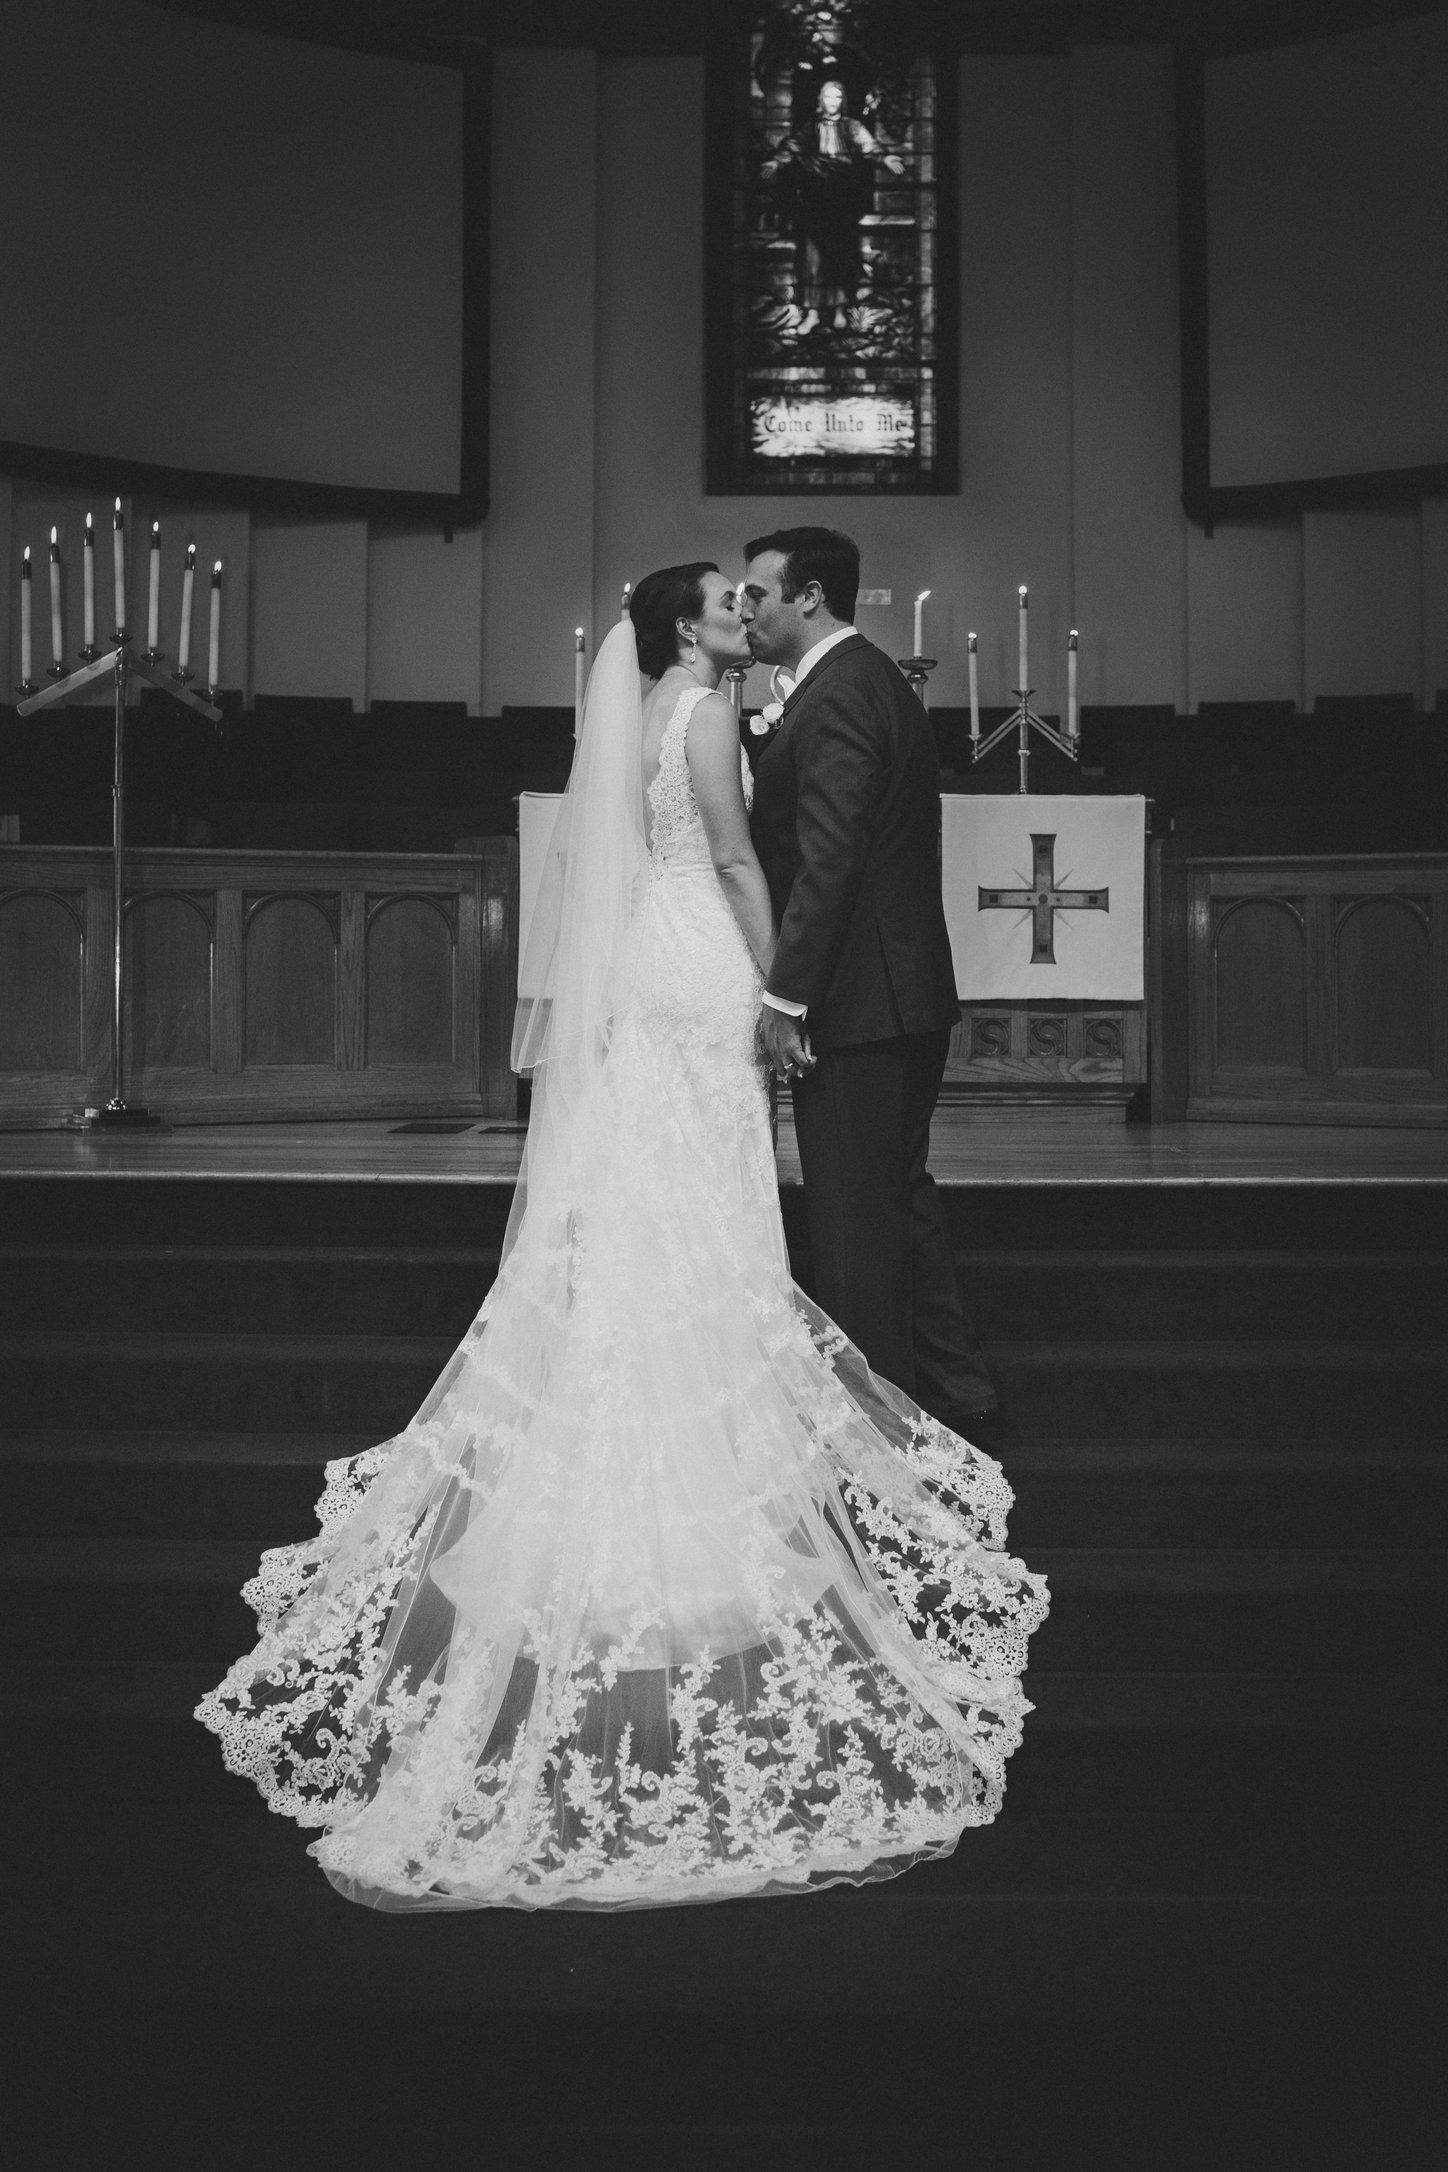 SandC-wedding-291.jpg